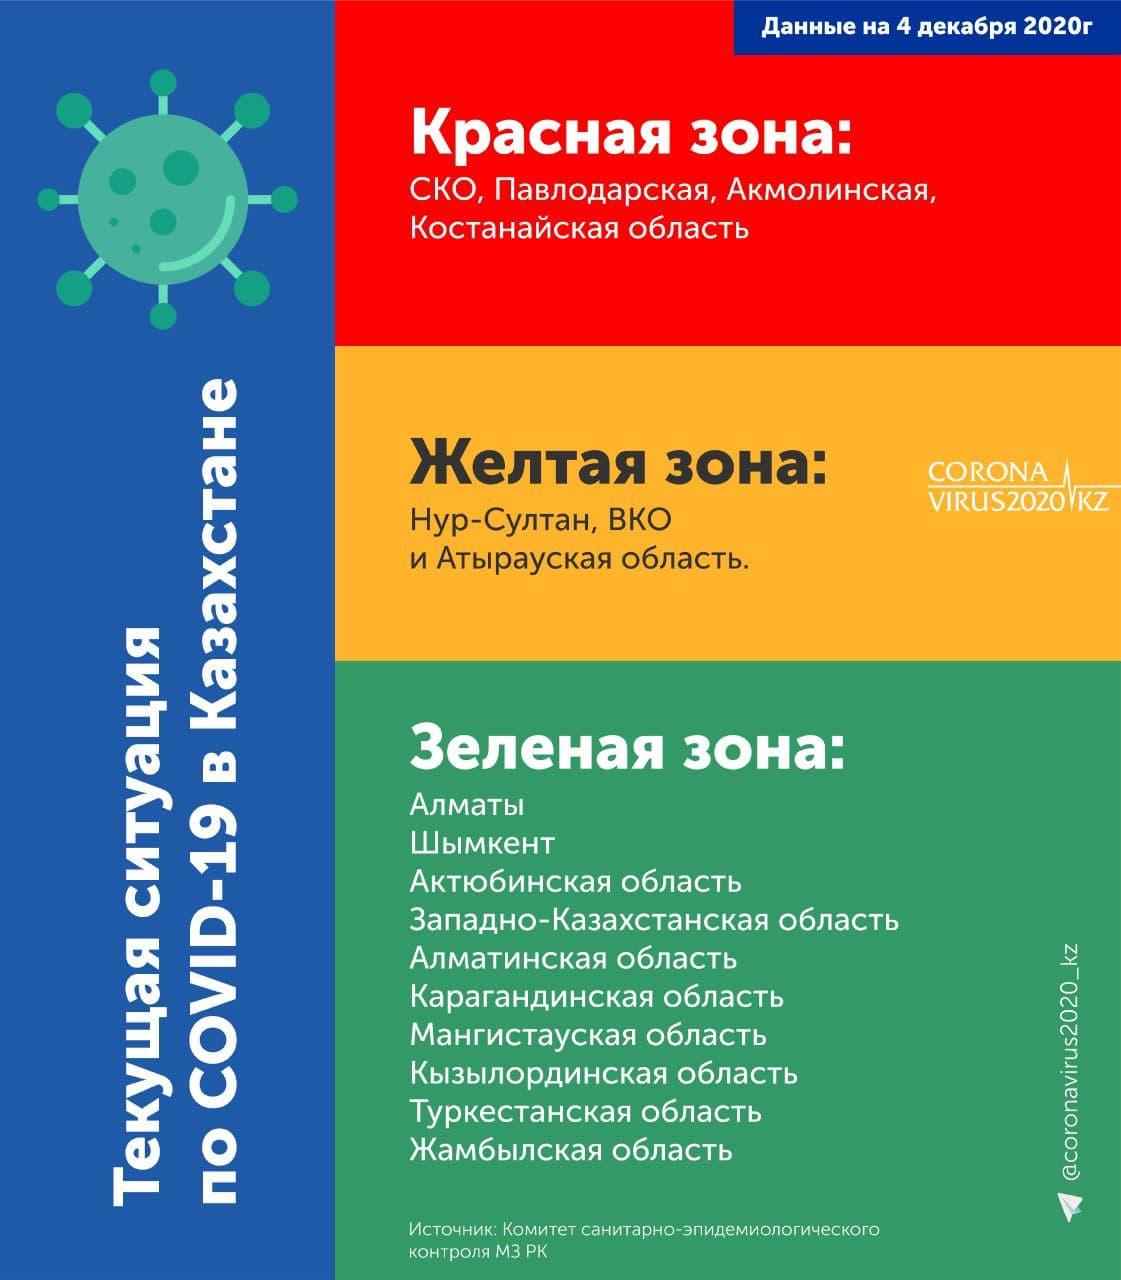 Коронавирус в Казахстане статистика